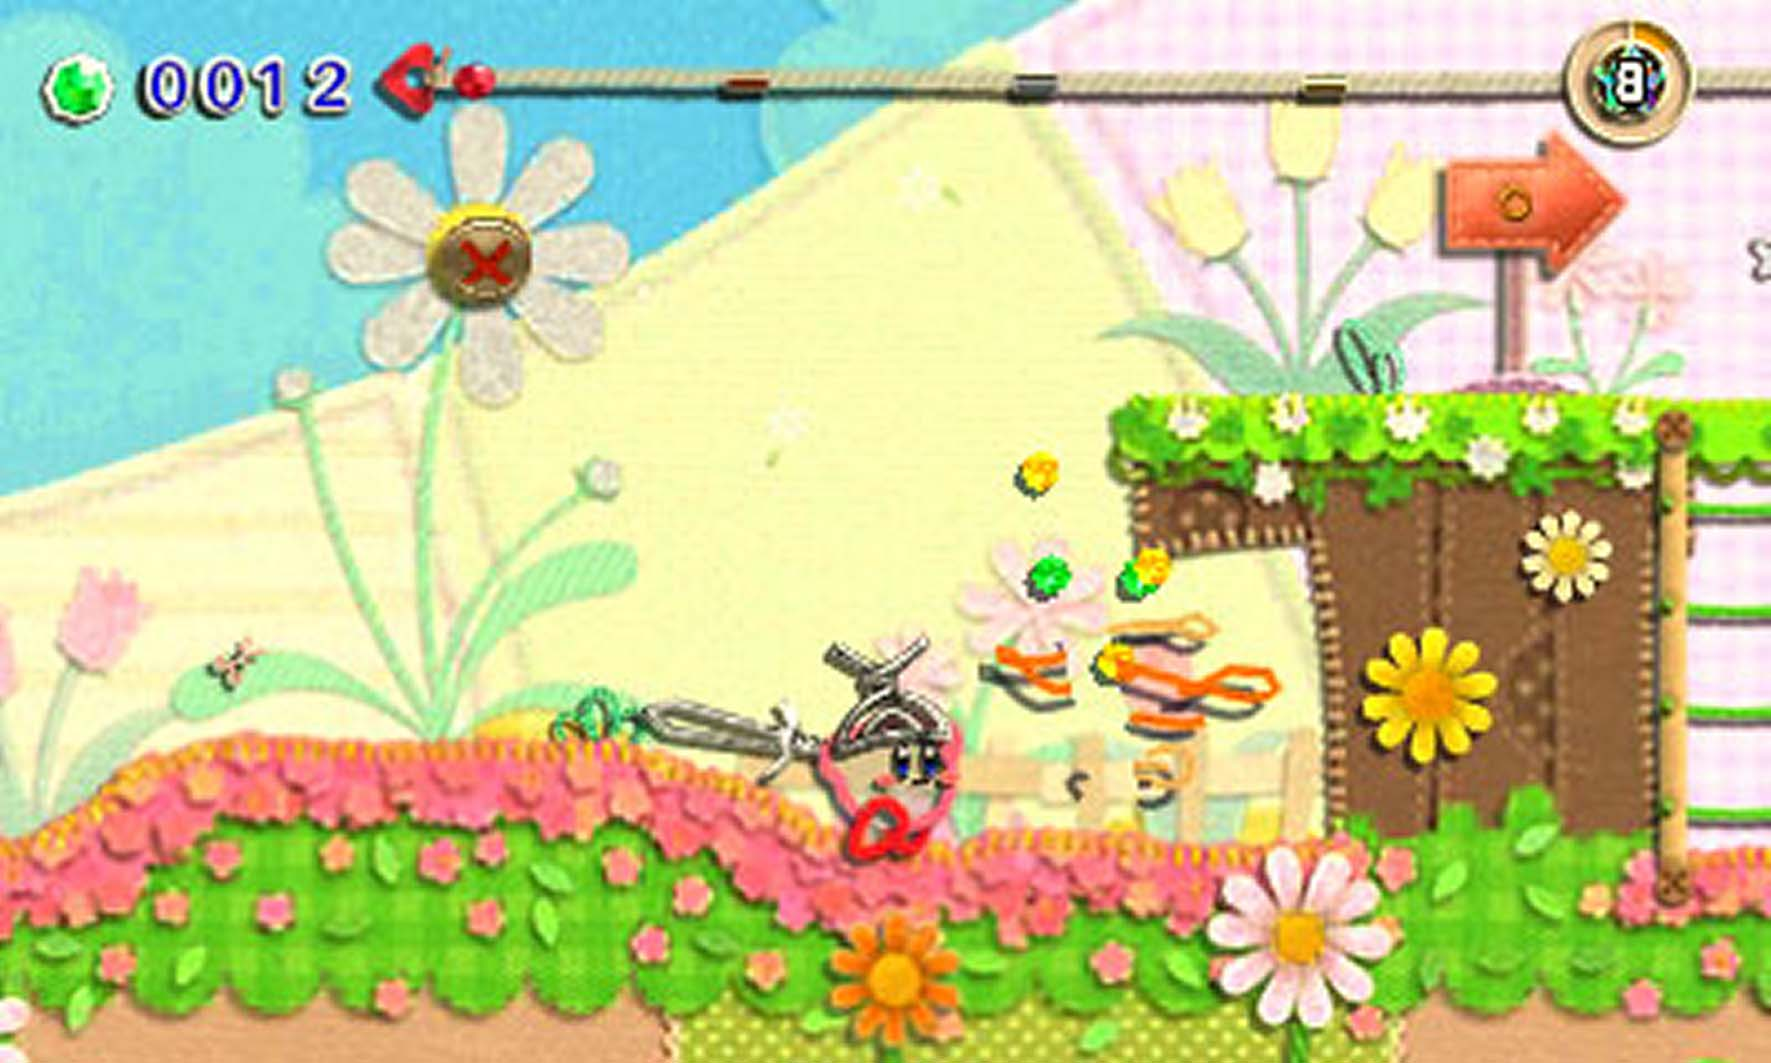 KirbysExtraEpicYarn_3DS_Review6.jpg